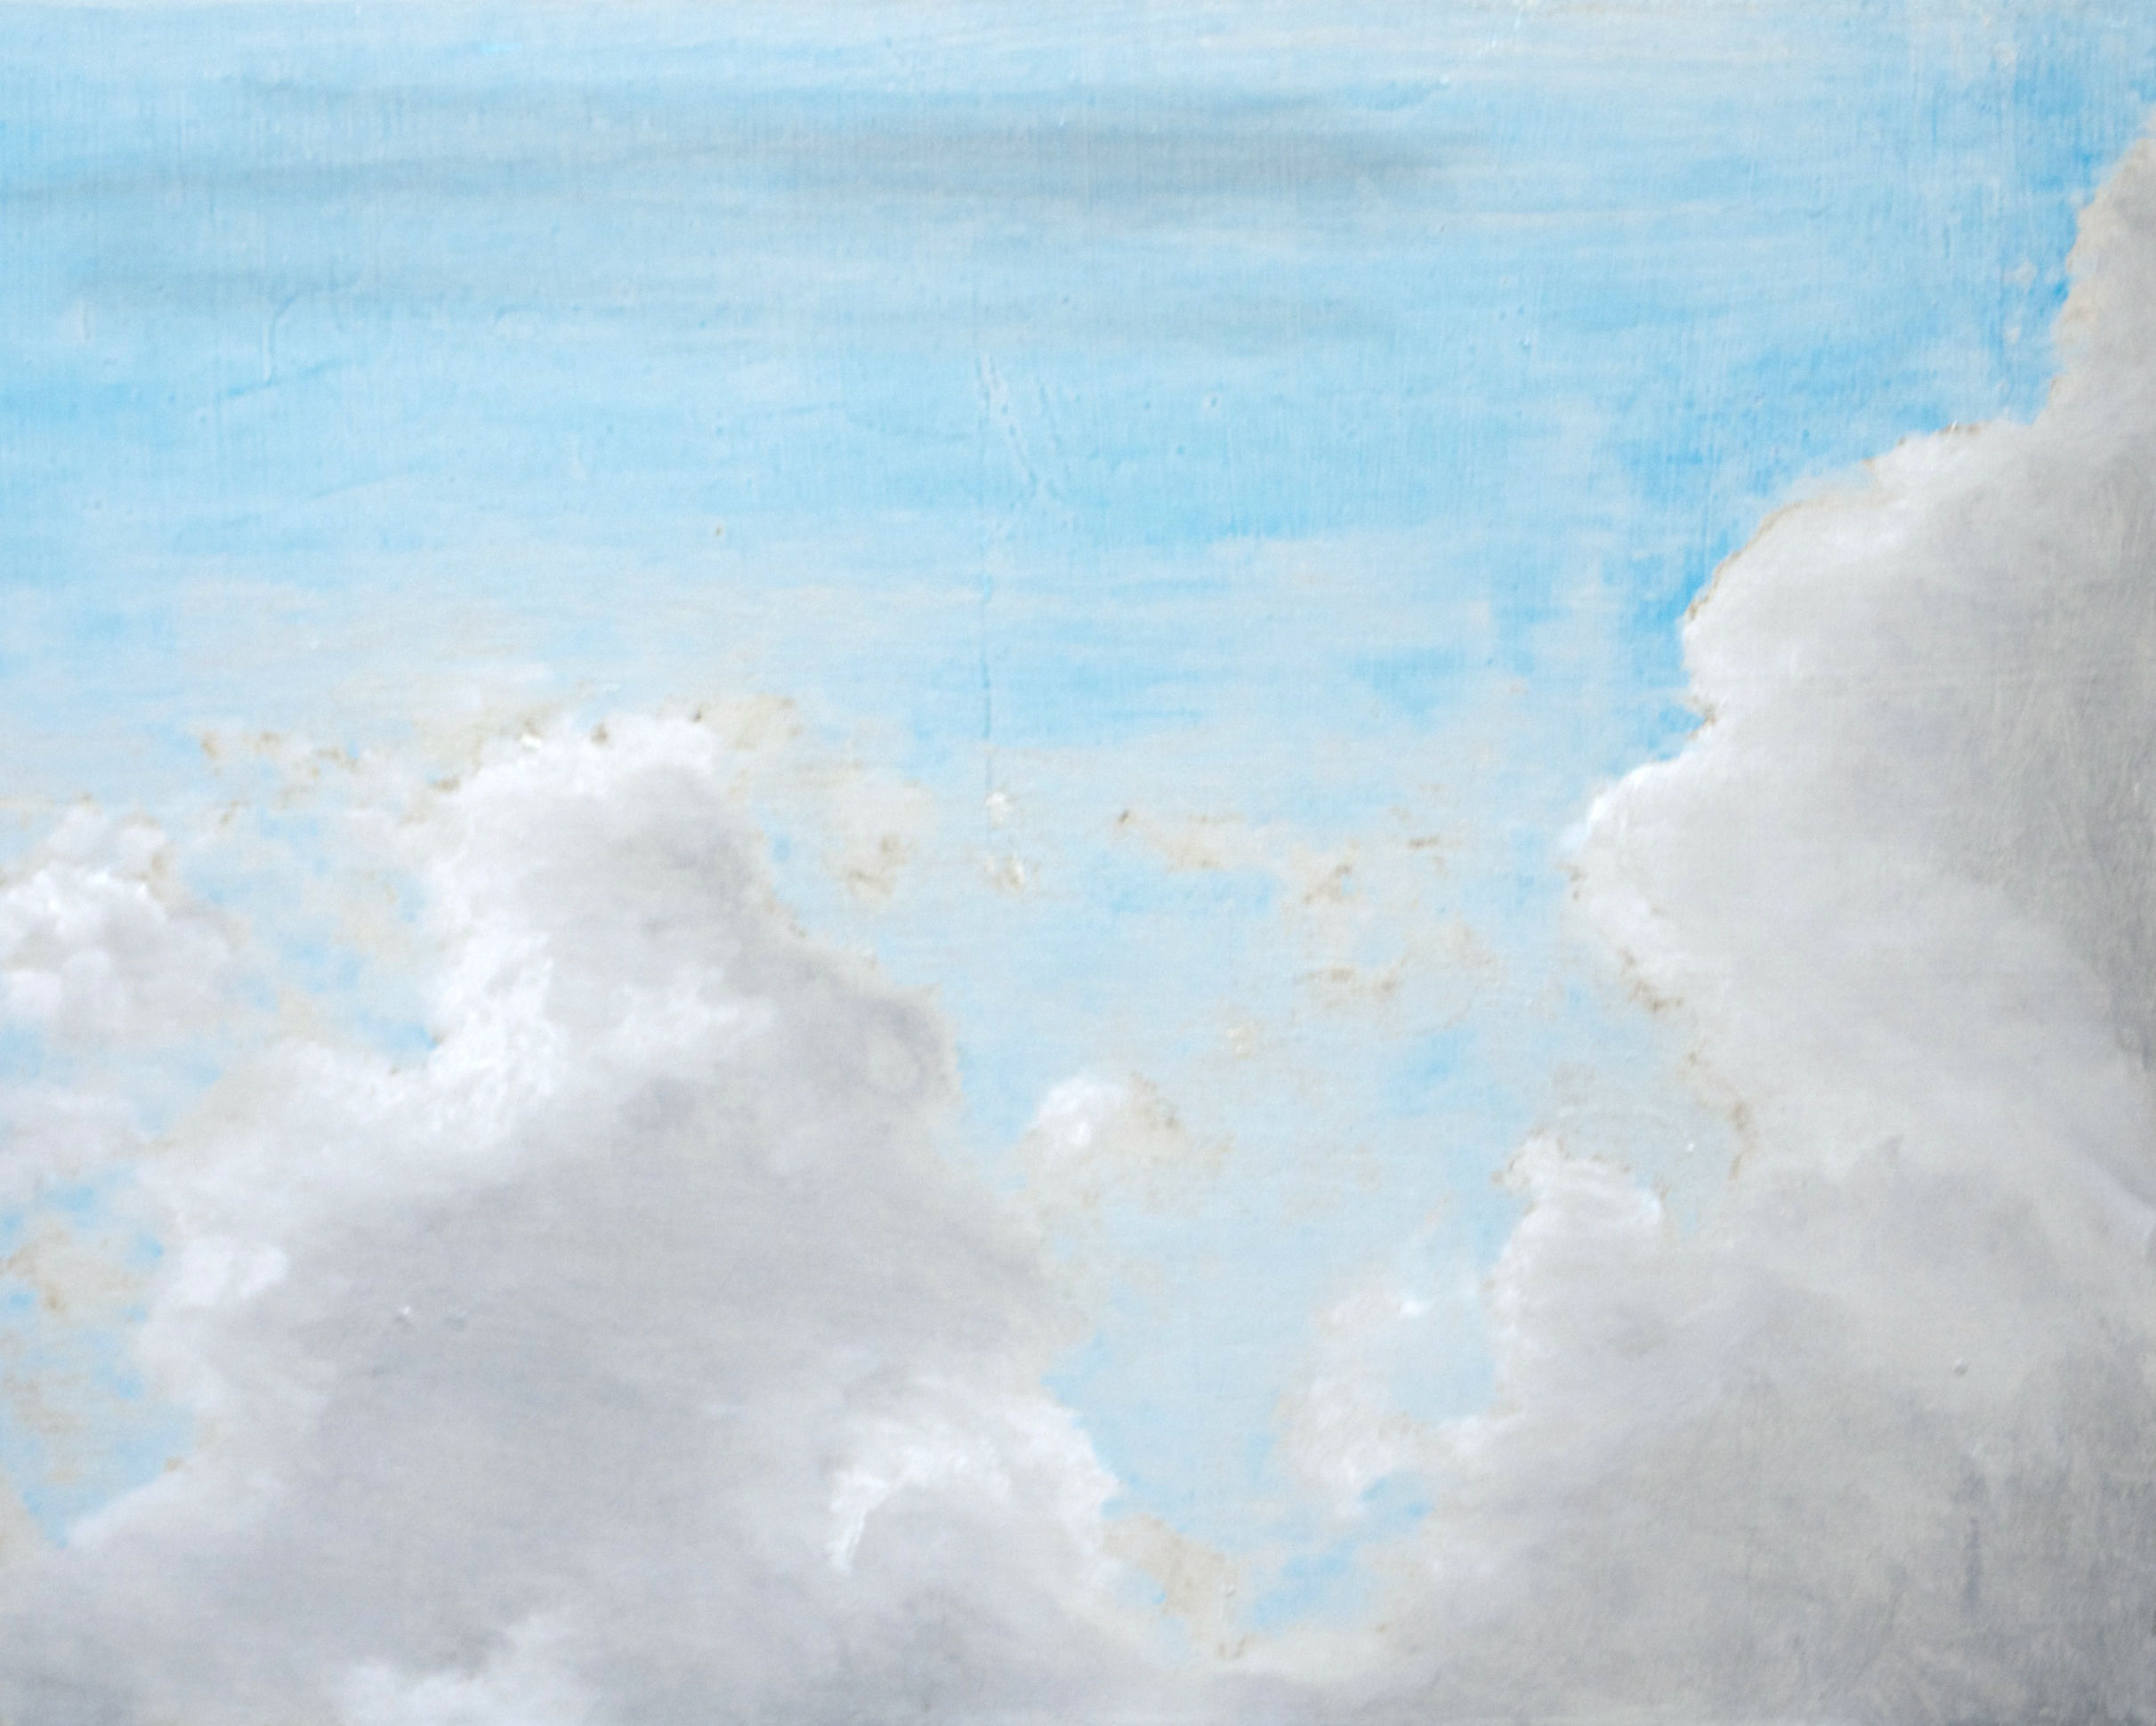 Cloud Study 5-1-13.jpg